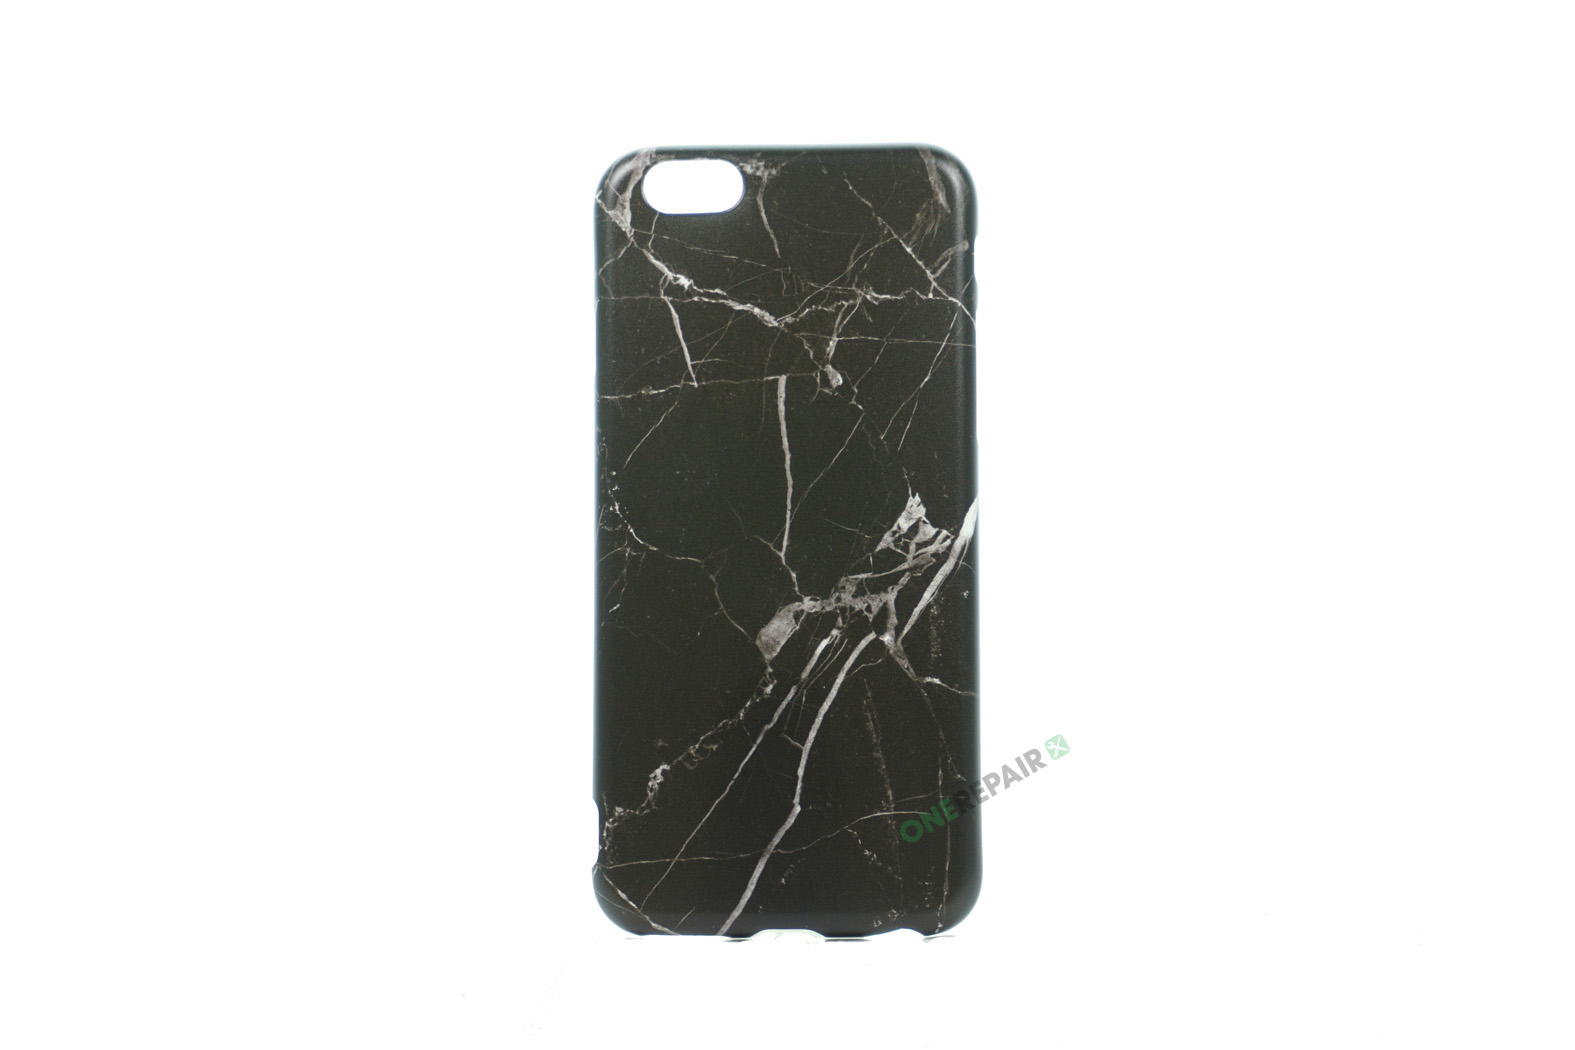 iPhone 6, 6S, A1549, A1586, A1589, A1633, A1688, A1700, A1691, Apple, Bagcover, Cover, Billig, Motiv, Marmor, Sort